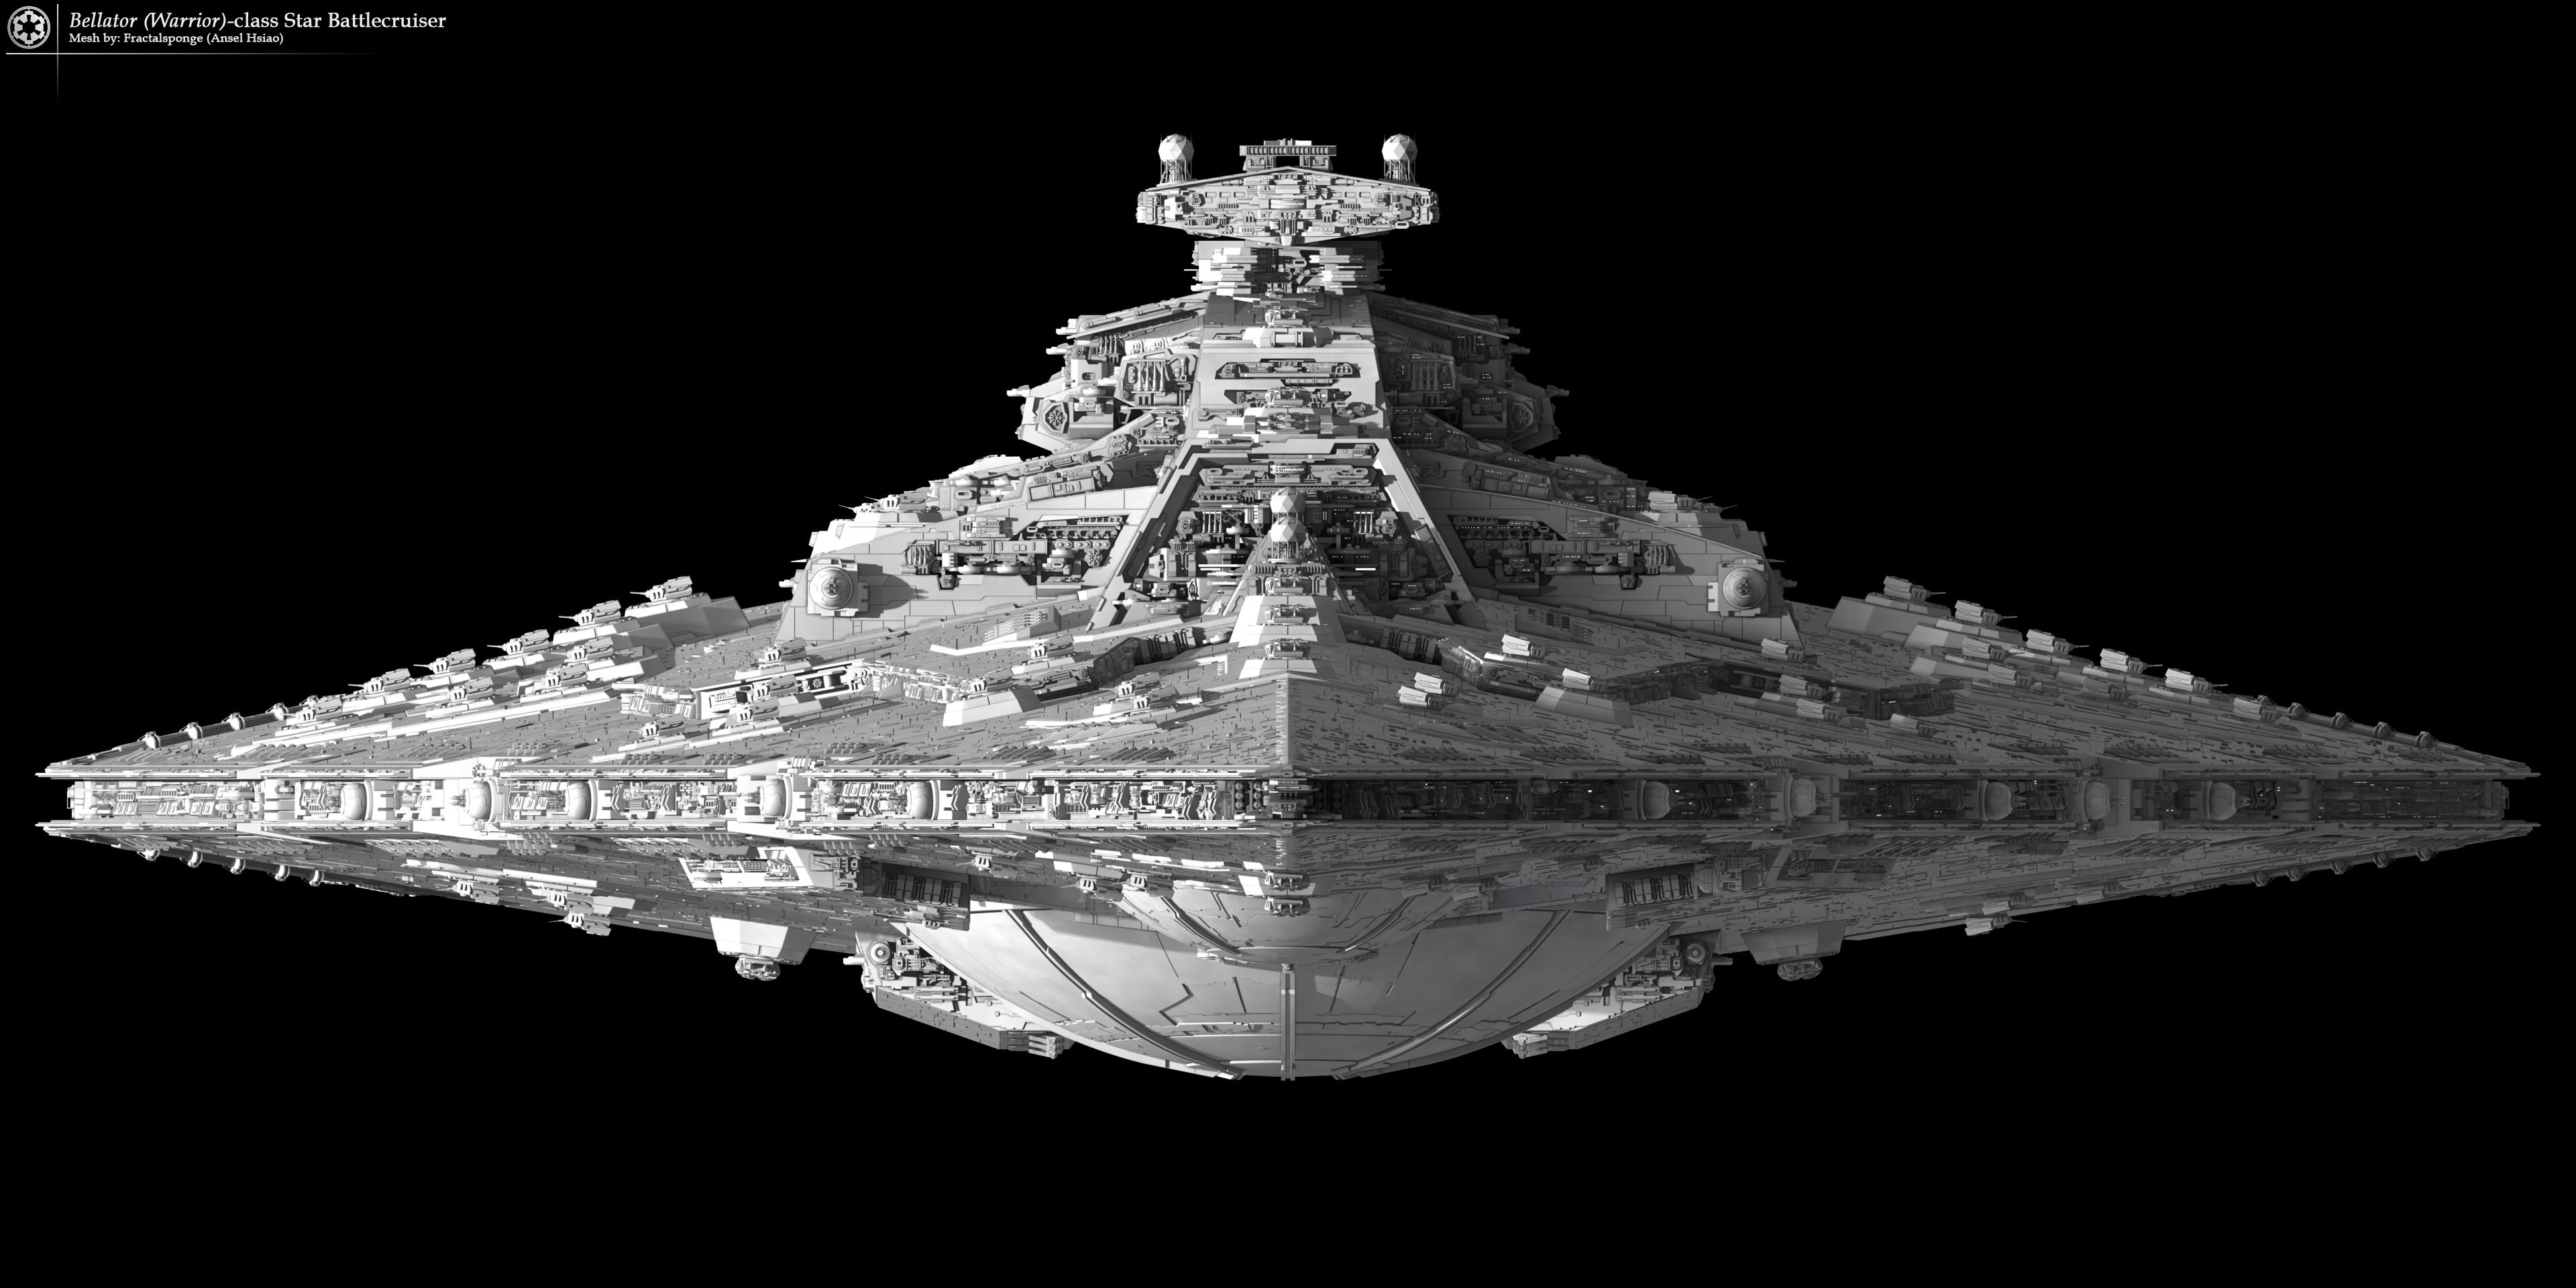 Sd09 - Star Wars Starship Wallpaper Hd , HD Wallpaper & Backgrounds